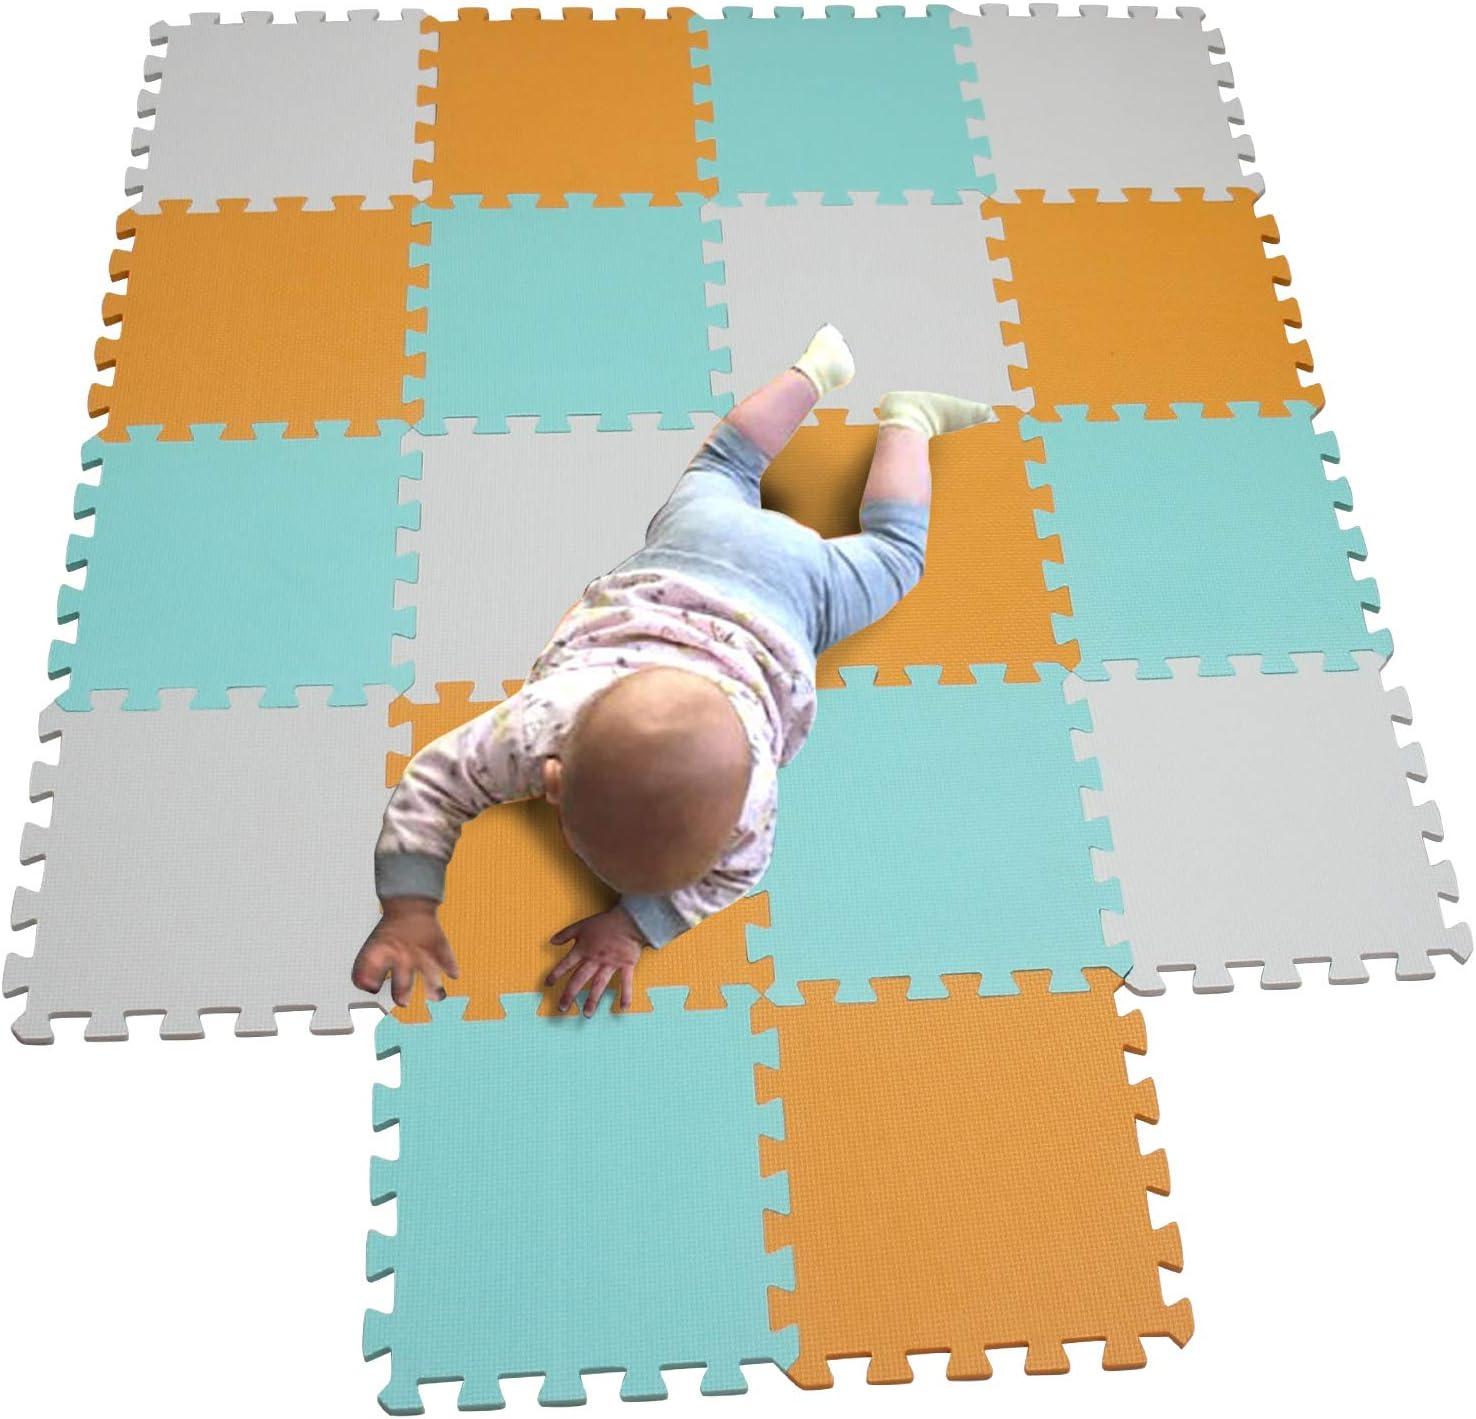 MQIAOHAM children puzzle mat play mat squares play mat tiles baby mats for floor puzzle mat soft play mats girl playmat carpet interlocking foam floor mats for baby white orange green 101102108